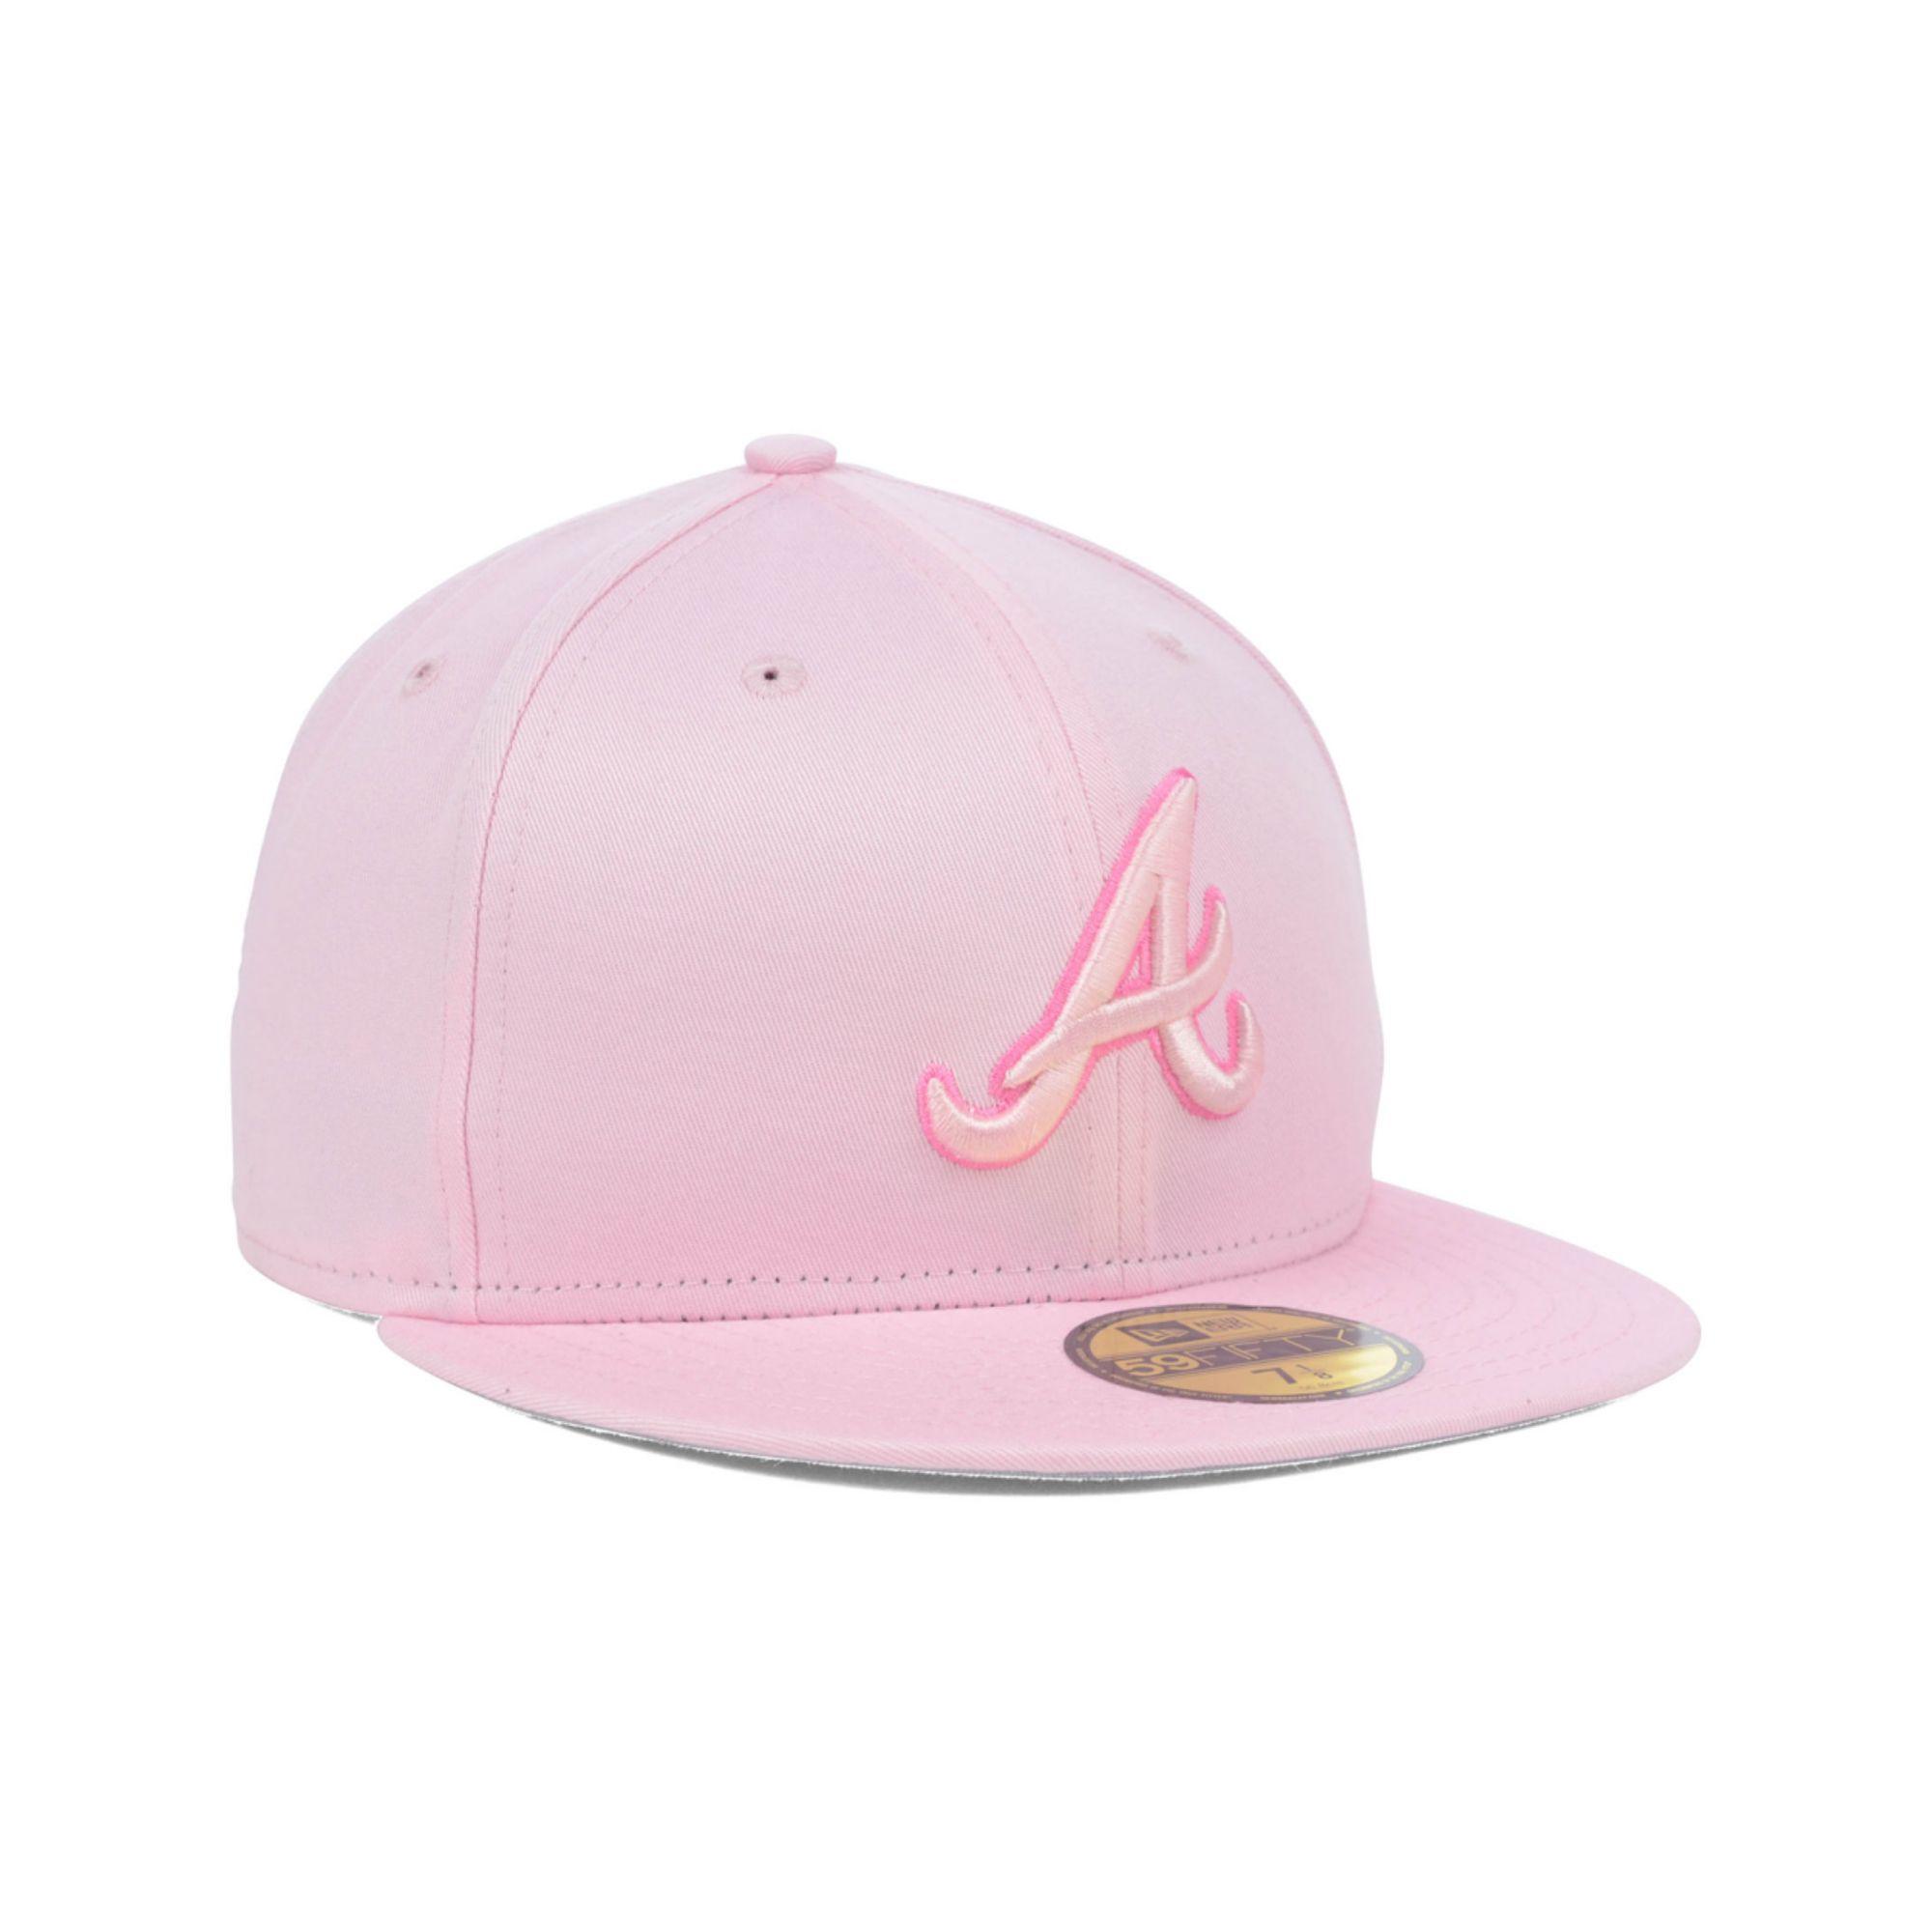 3328105fff2 canada pink gray new era york yankees mlb pop tonal 59fifty cap new e6049  fce63